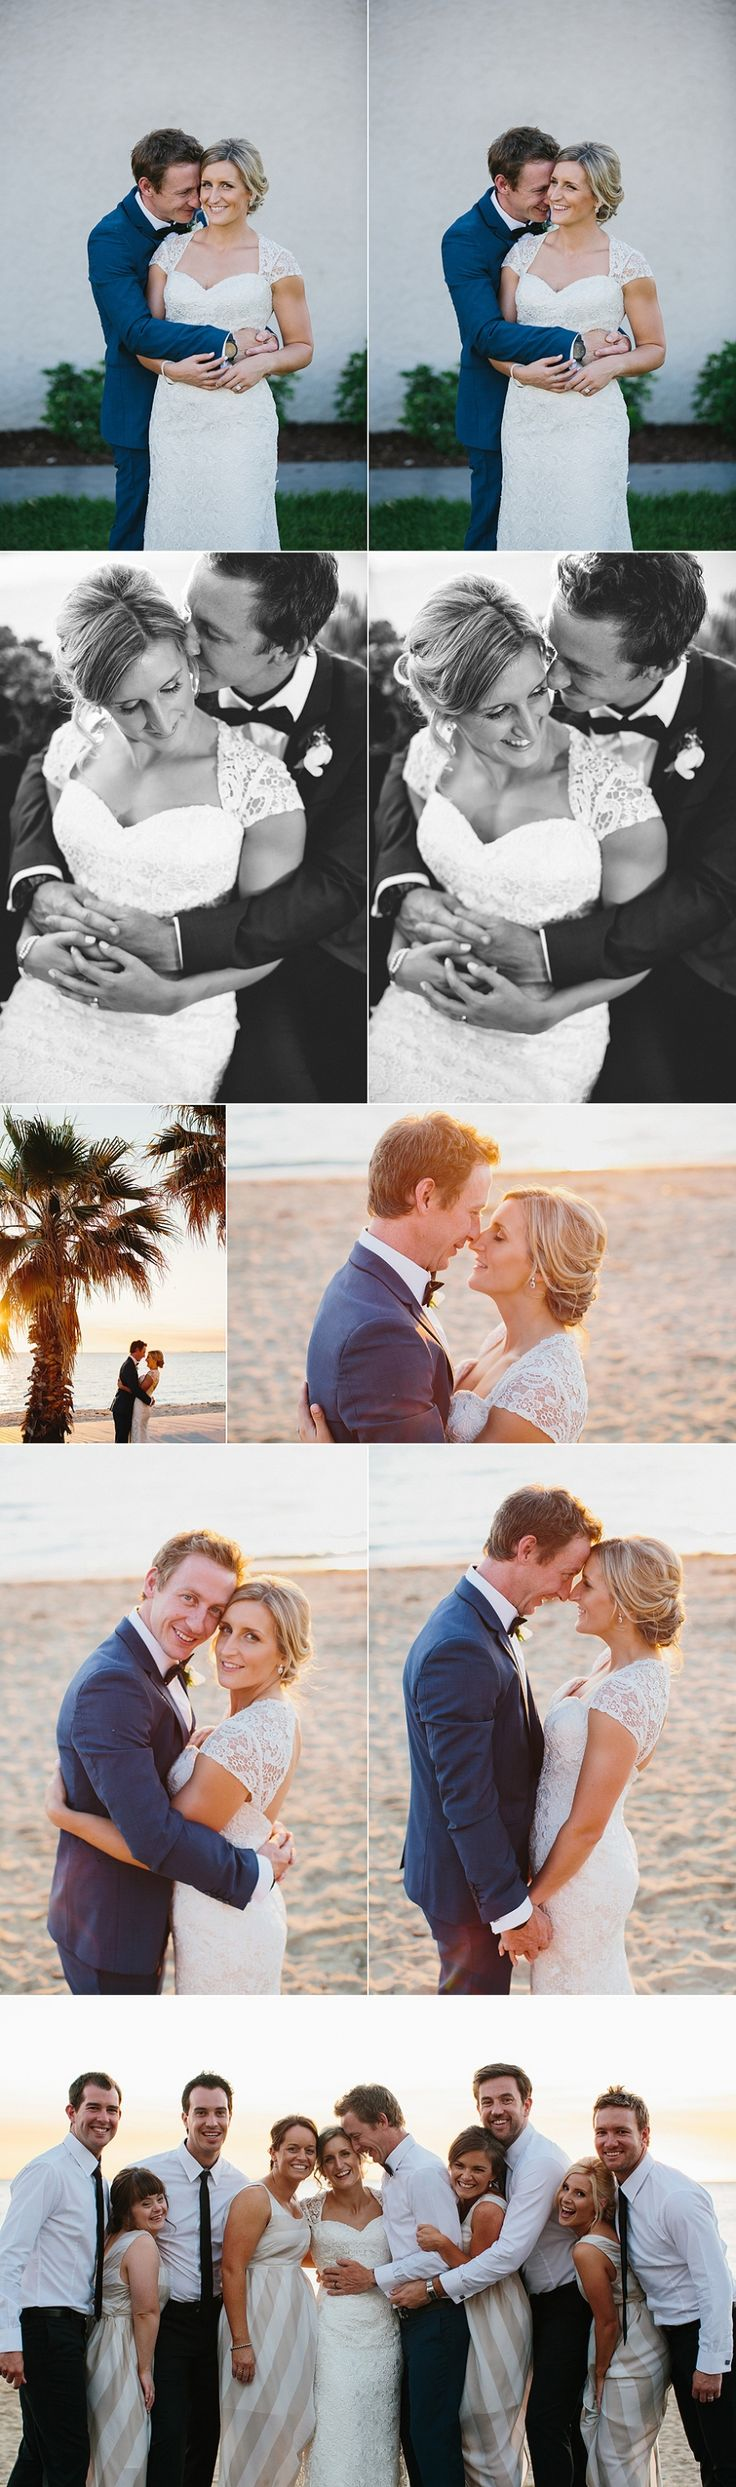 damian + lucy   encore st kilda sea baths wedding » VANESSA NORRIS PHOTOGRAPHY